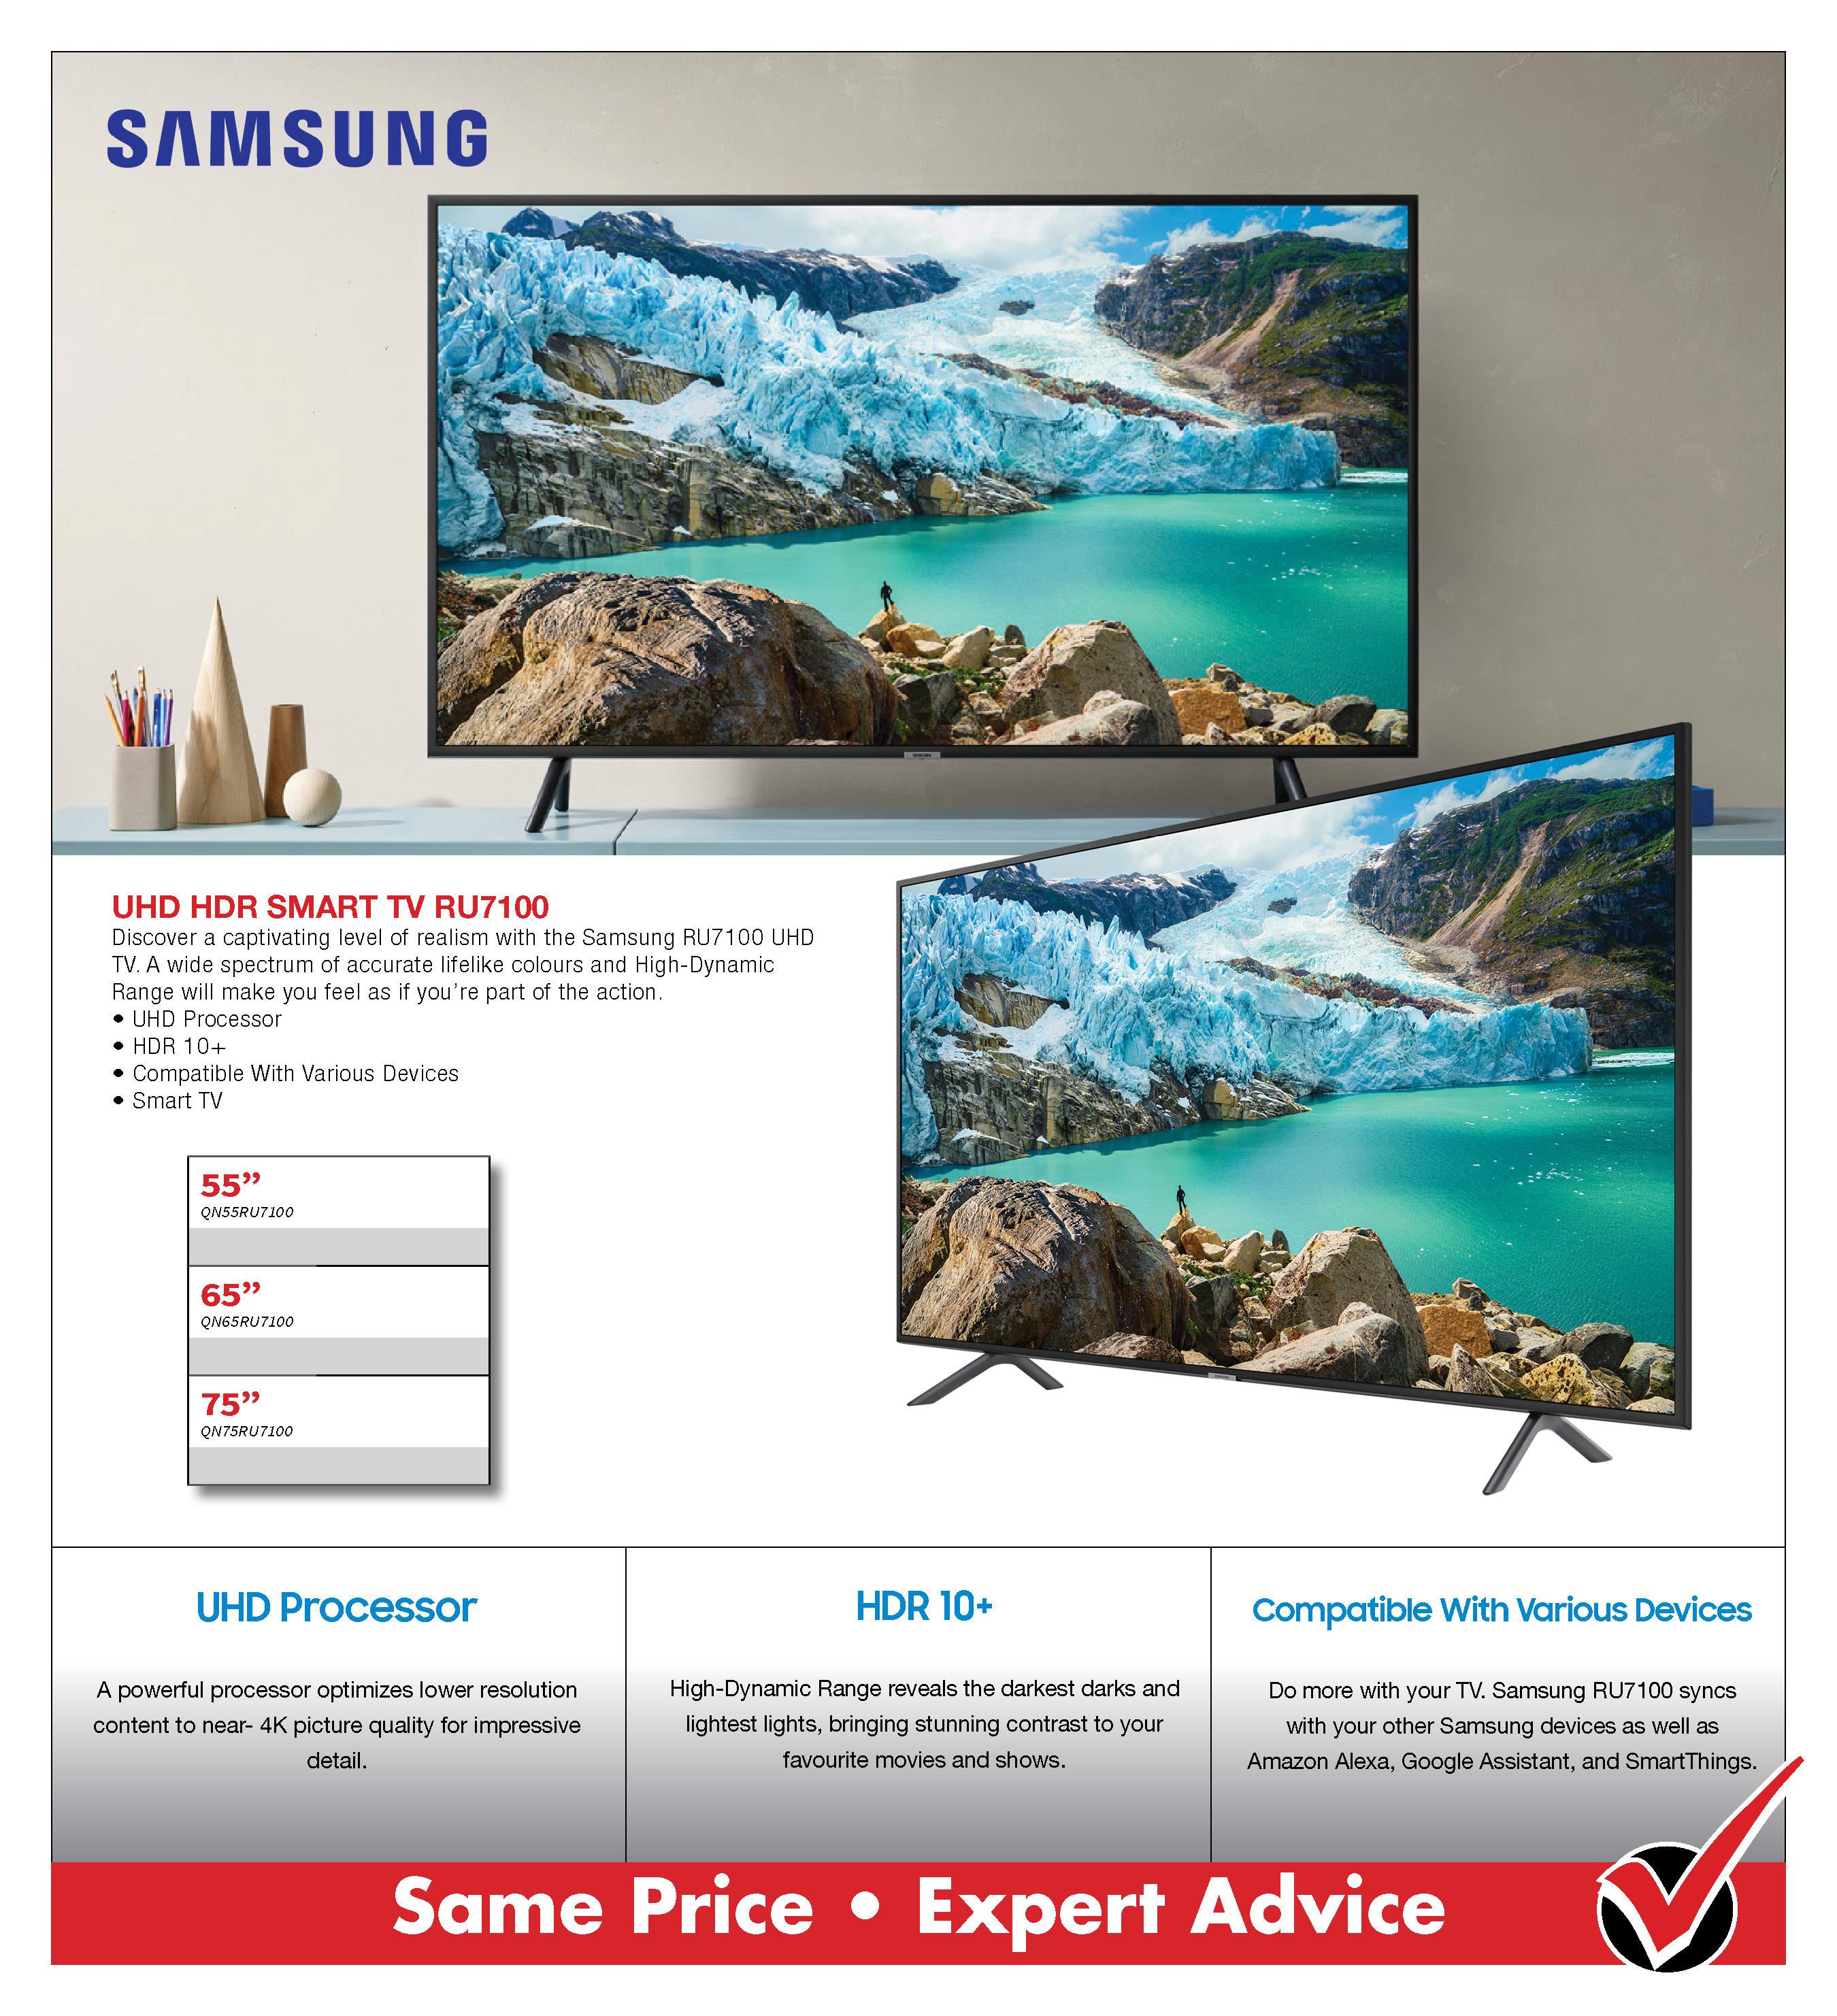 Samsung RU7100 Smart UHD TV